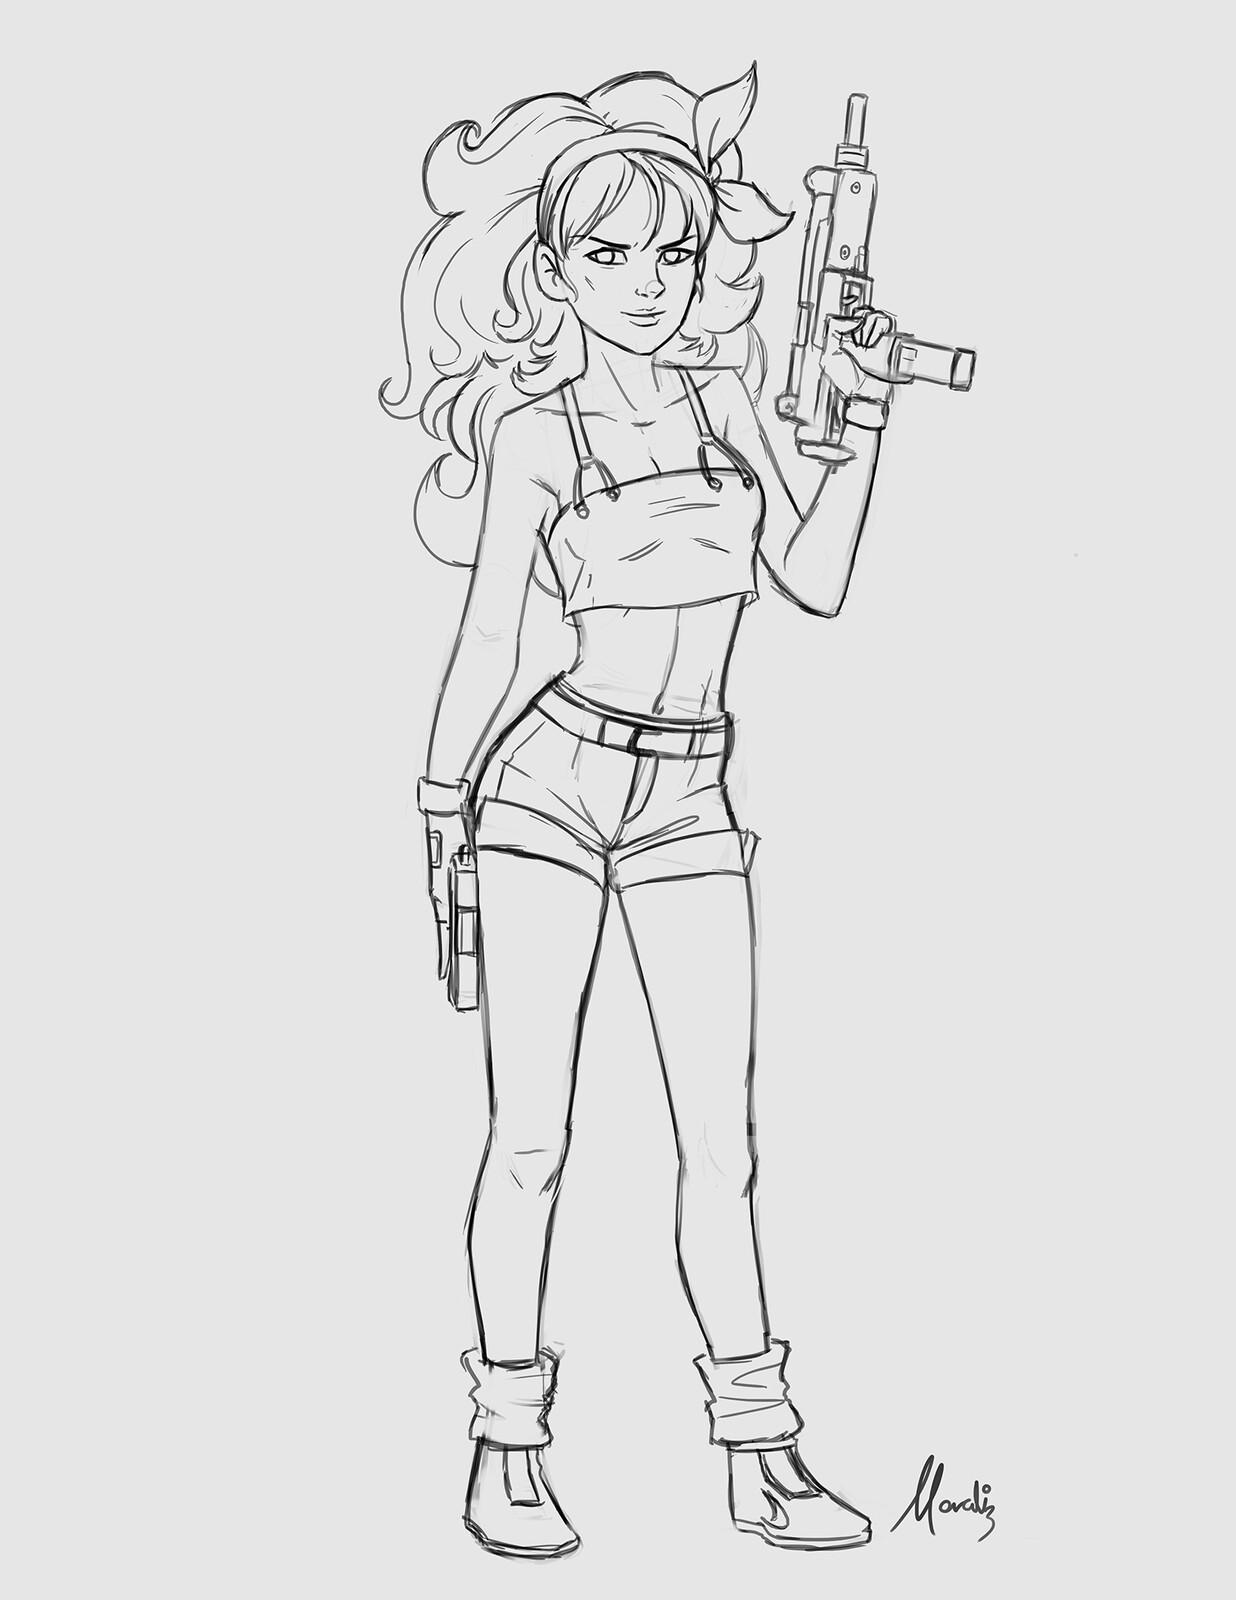 My initial sketch.